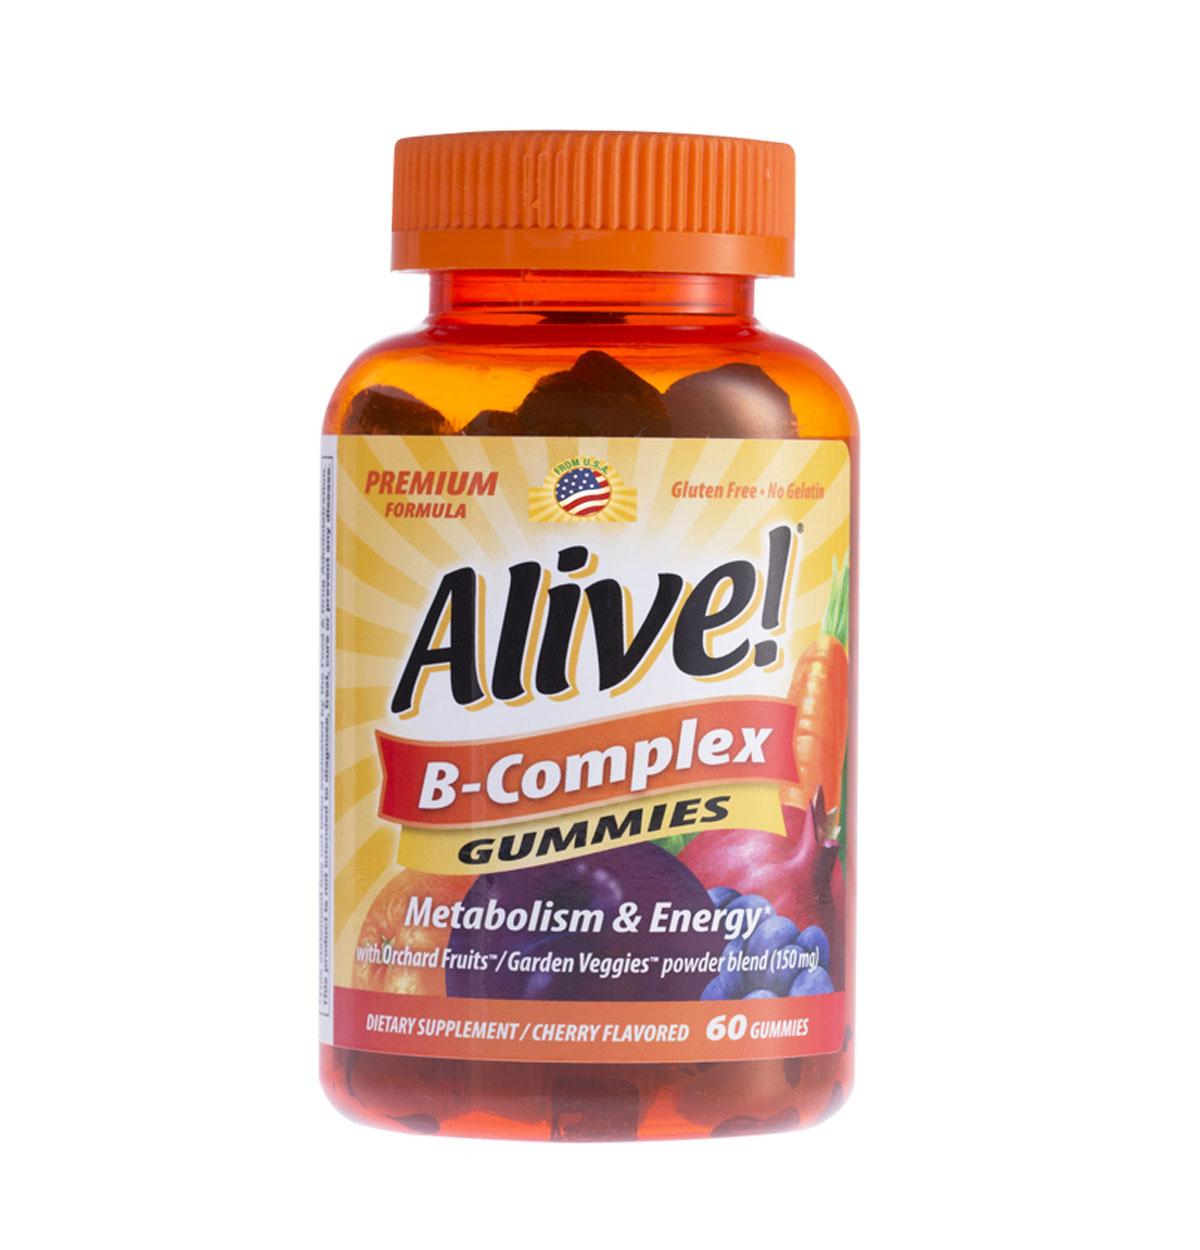 Alive! B-Complex Gummies ขนาด 60 กัมมี่